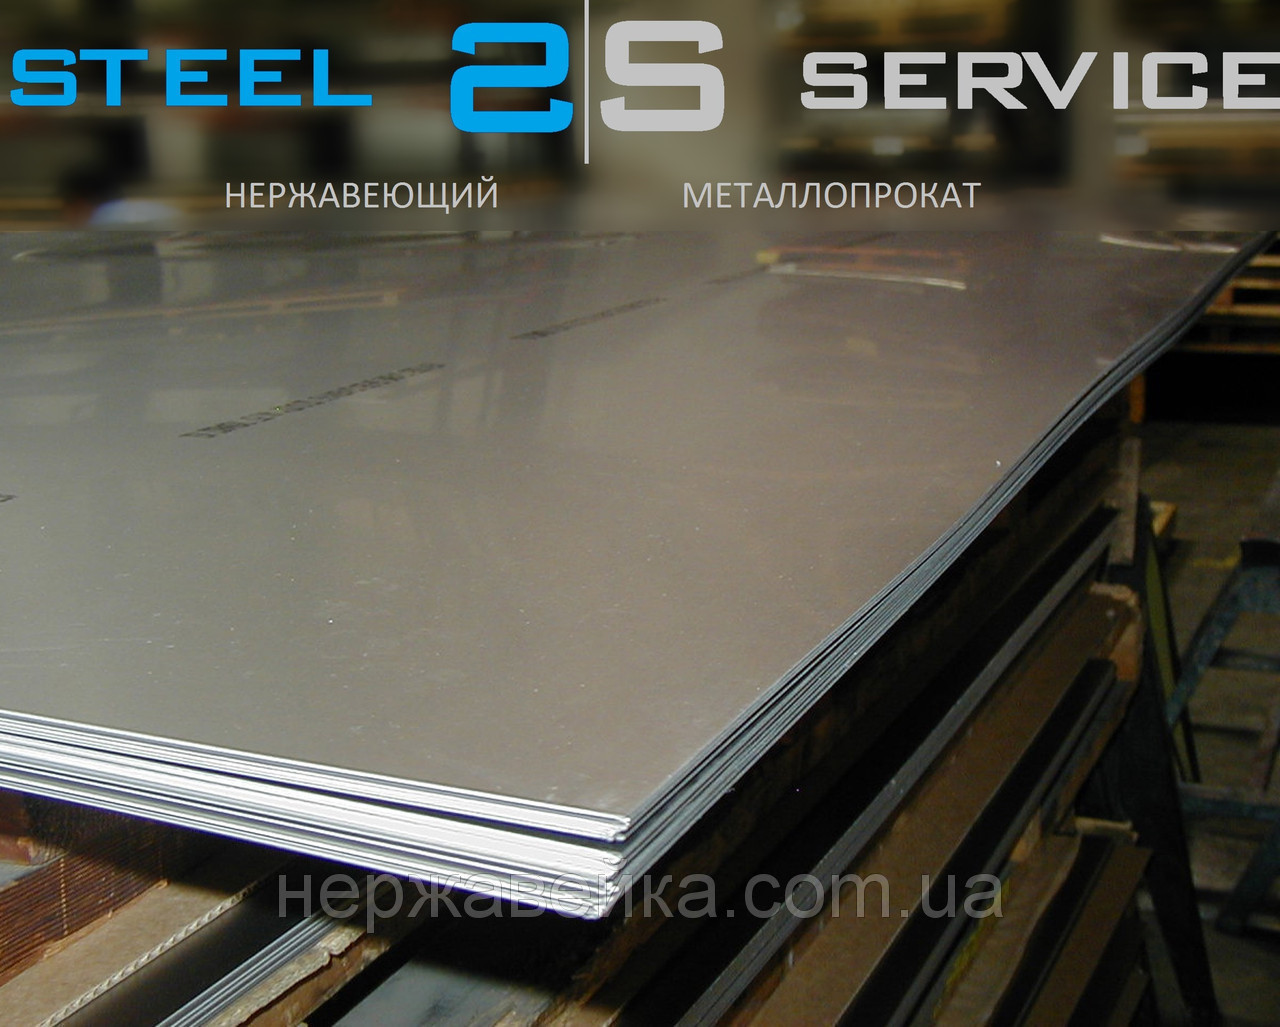 Нержавейка лист 16х1500х6000мм AISI 410S(08Х13) F1 - горячекатанный, технический